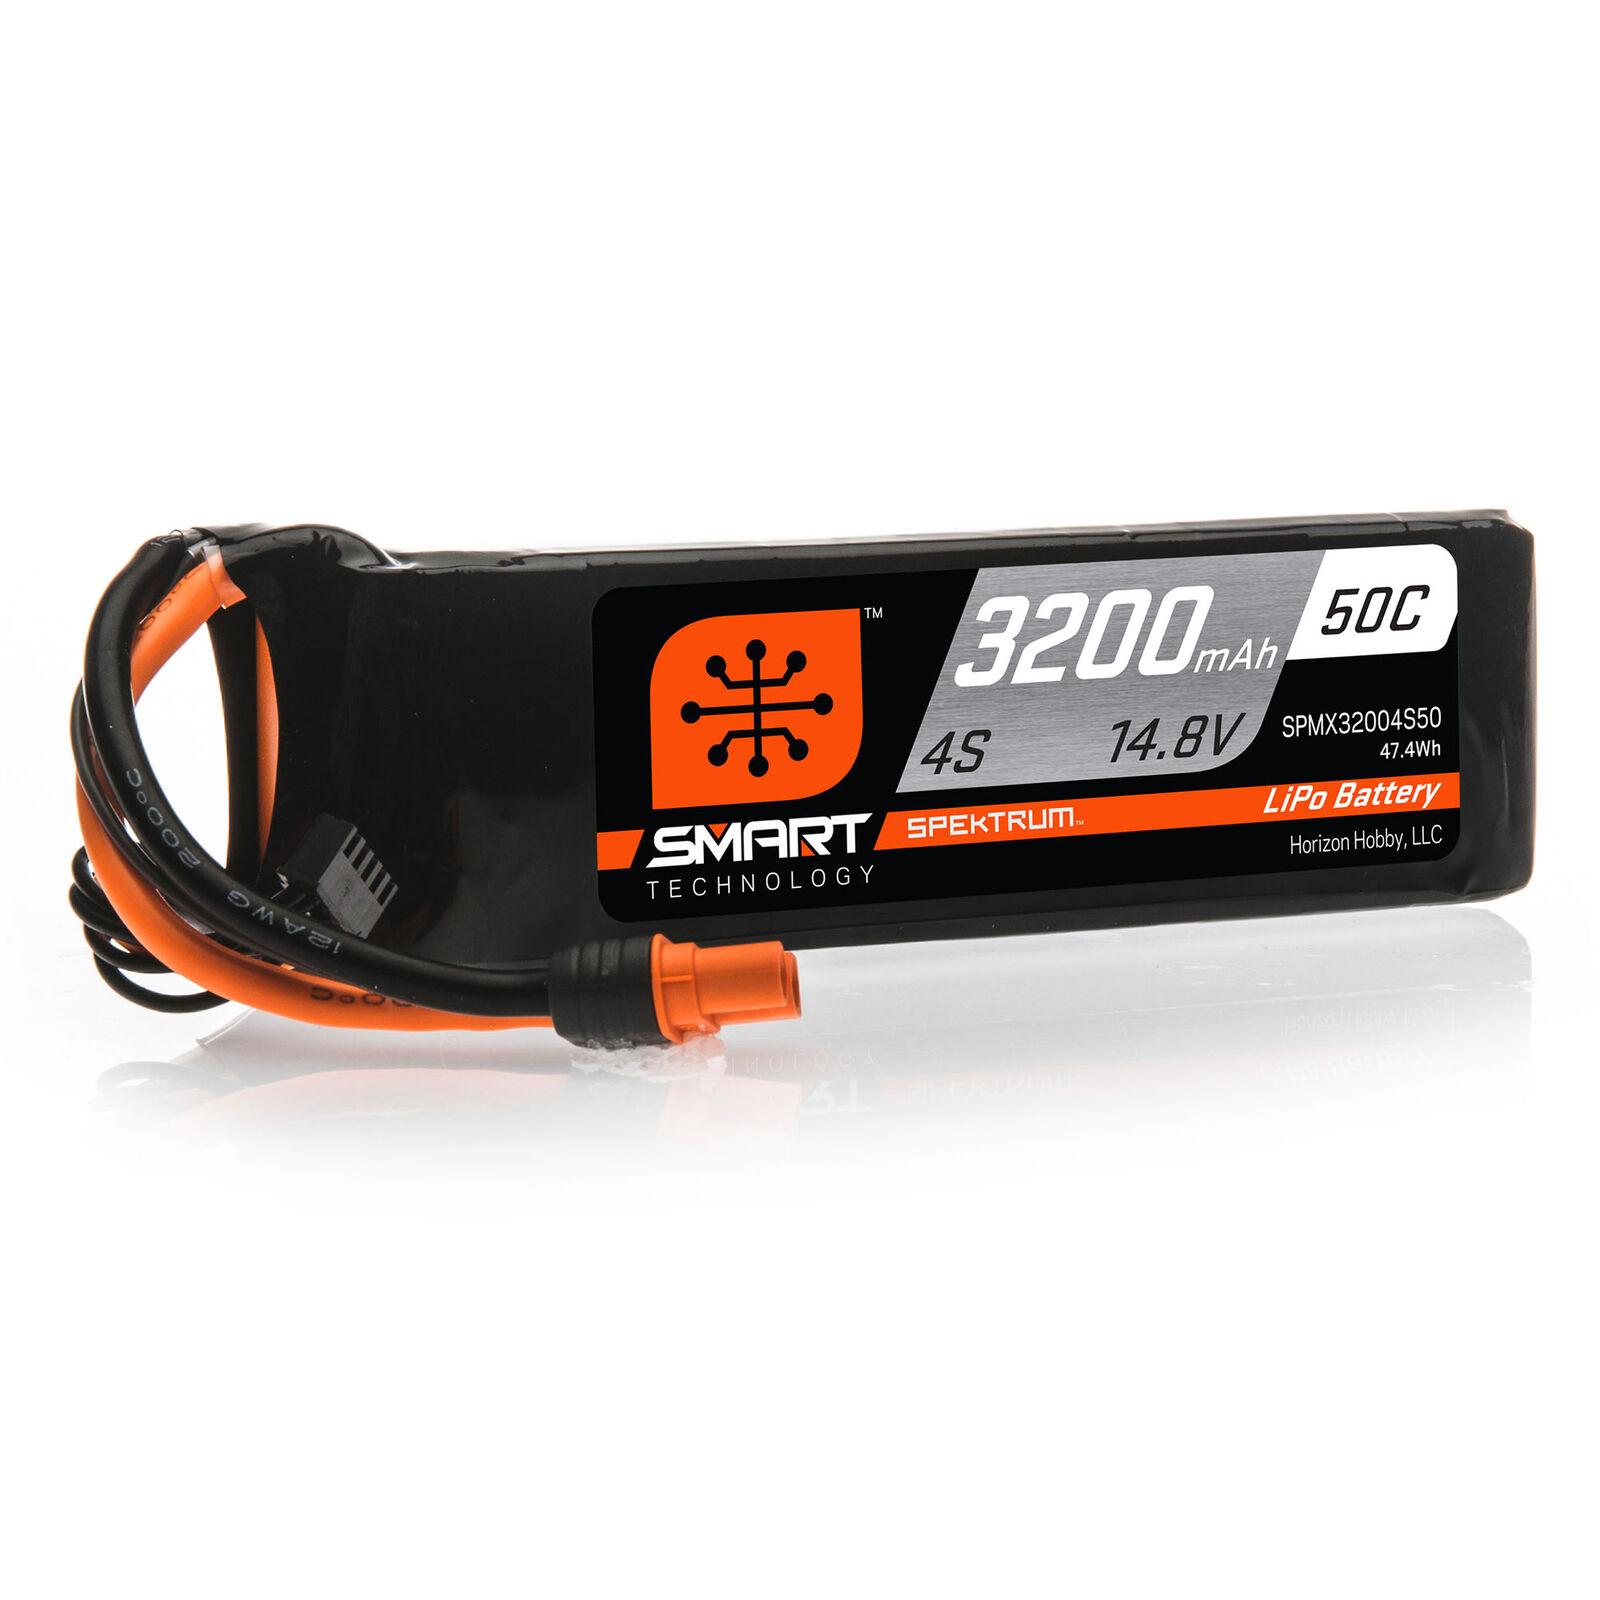 14.8V 3200mAh 4S 50C Smart LiPo Battery: IC3